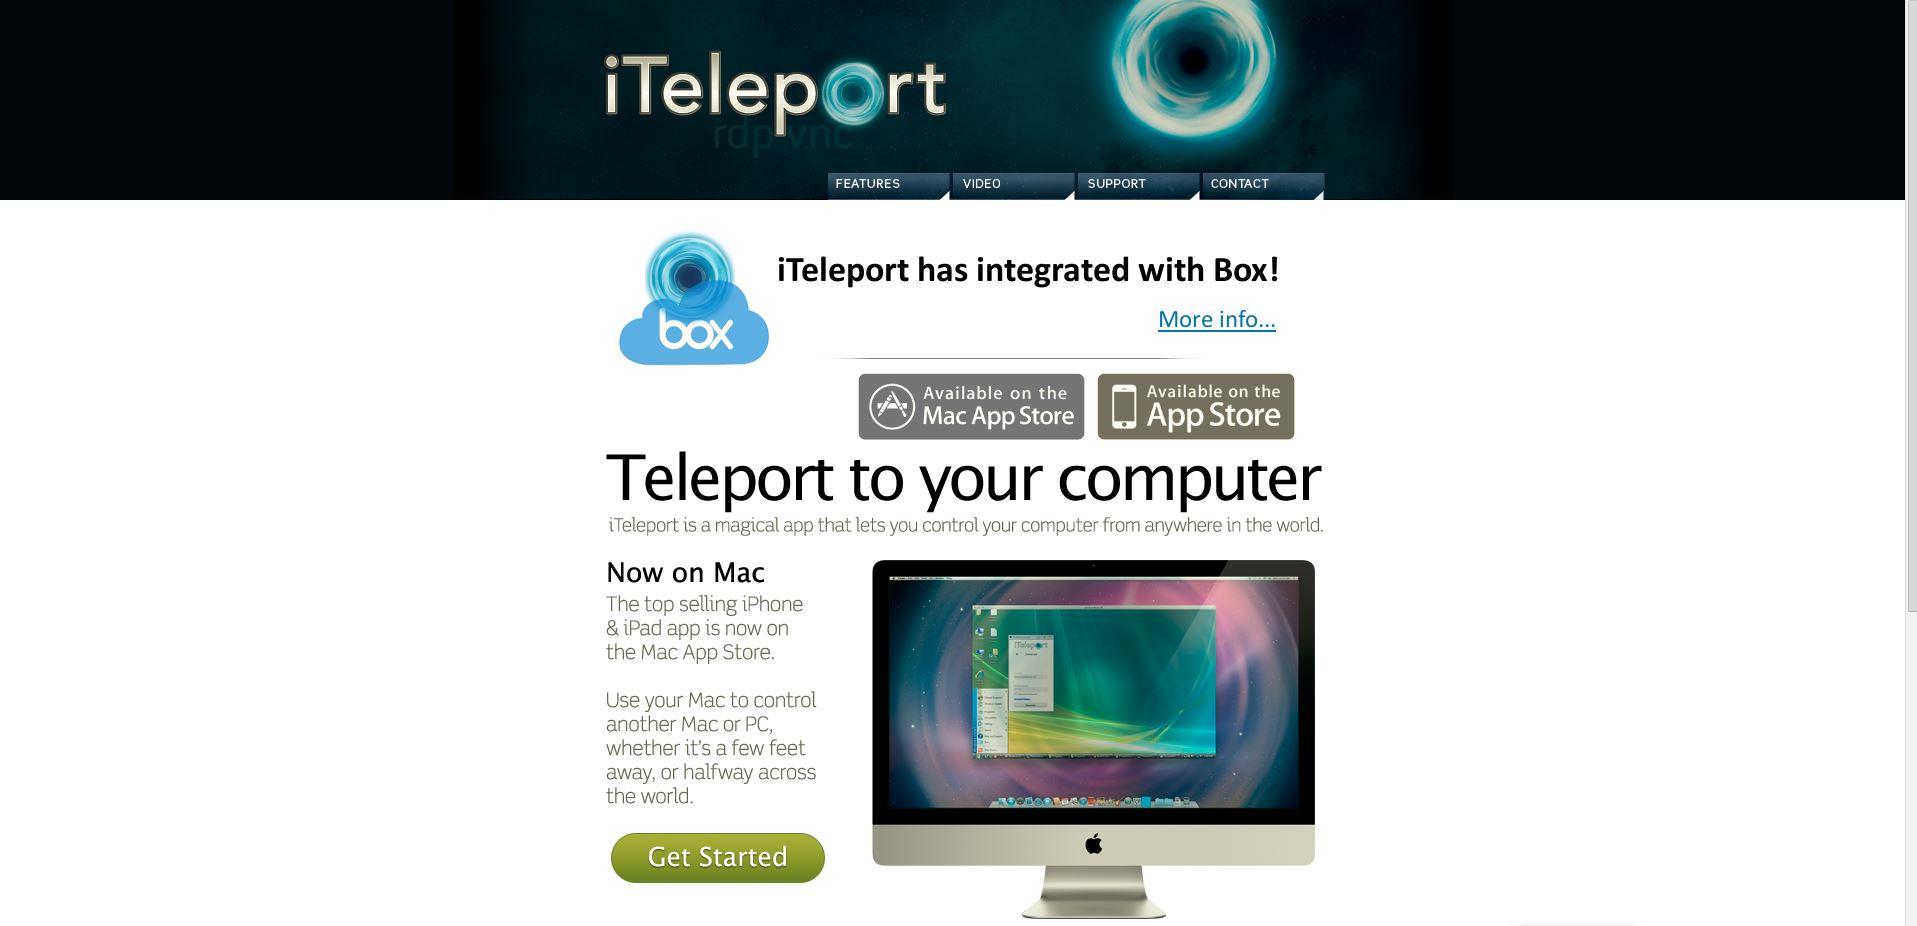 Iteleport Support